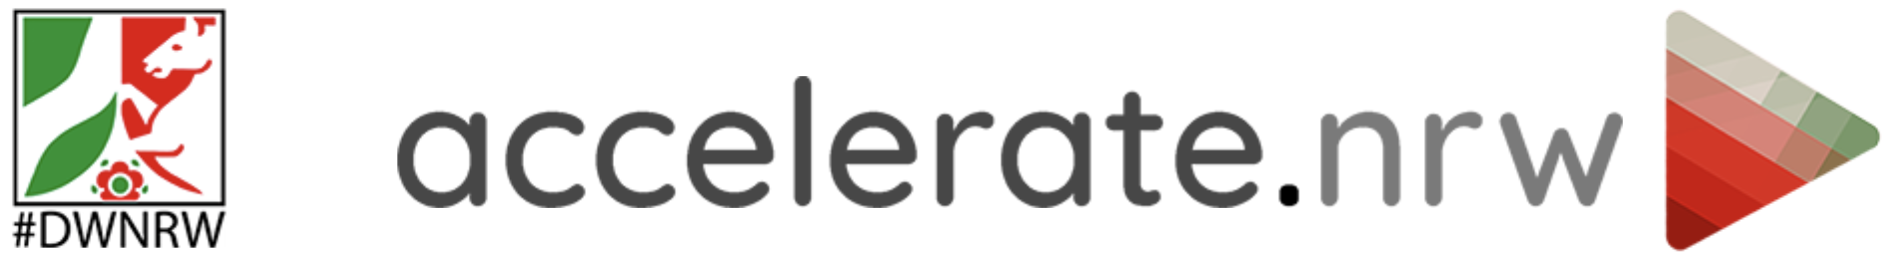 Logo accelerate.nrw